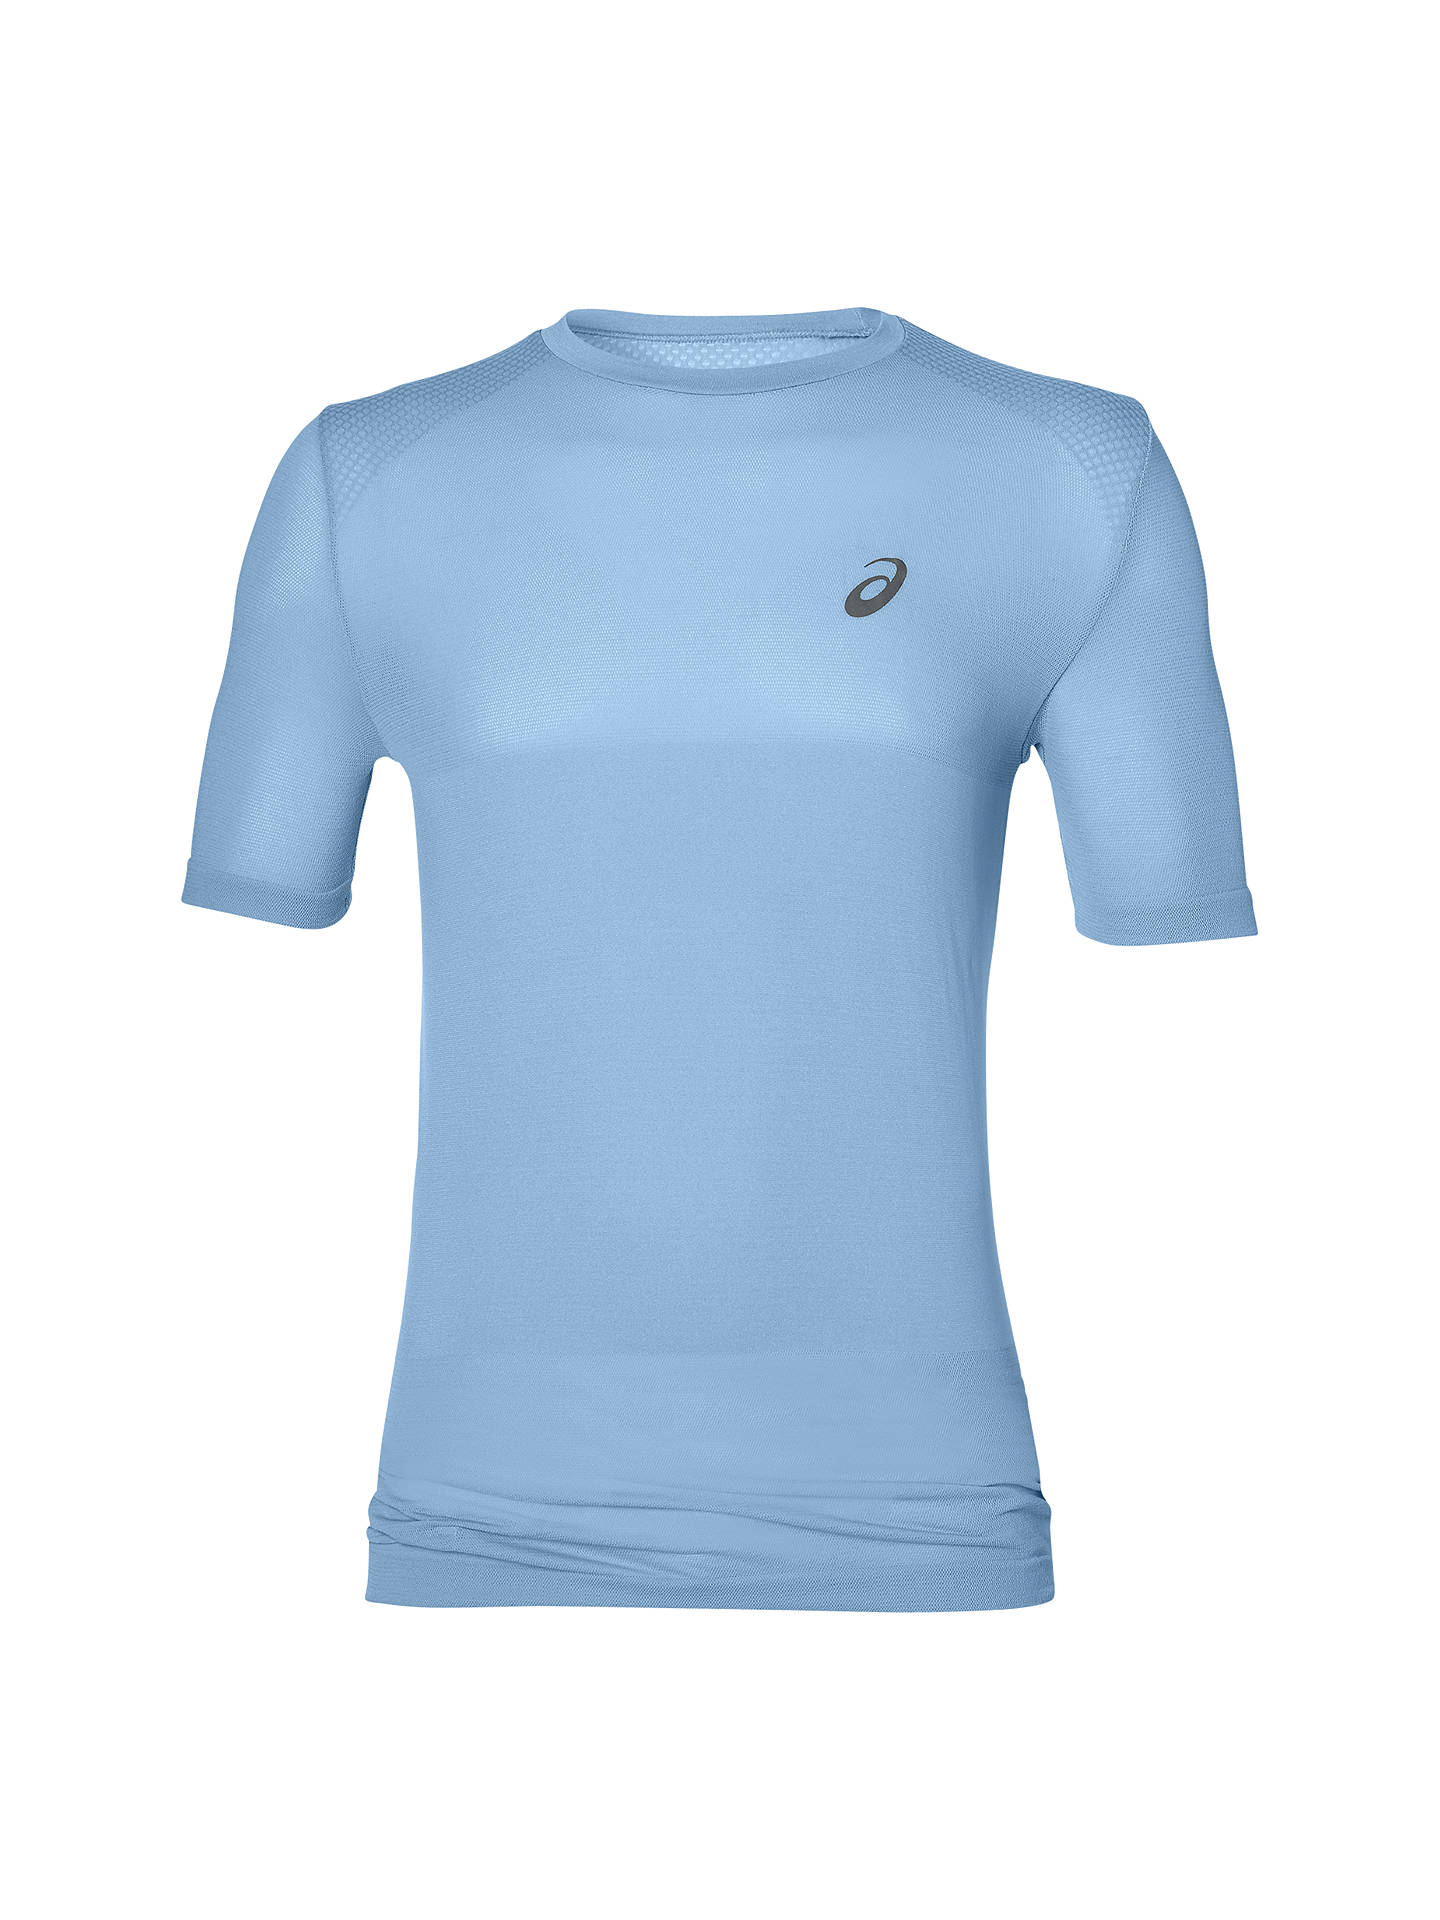 73bdaa07b81e Buy Asics Fuzex Seamless Short Sleeve Running T-Shirt